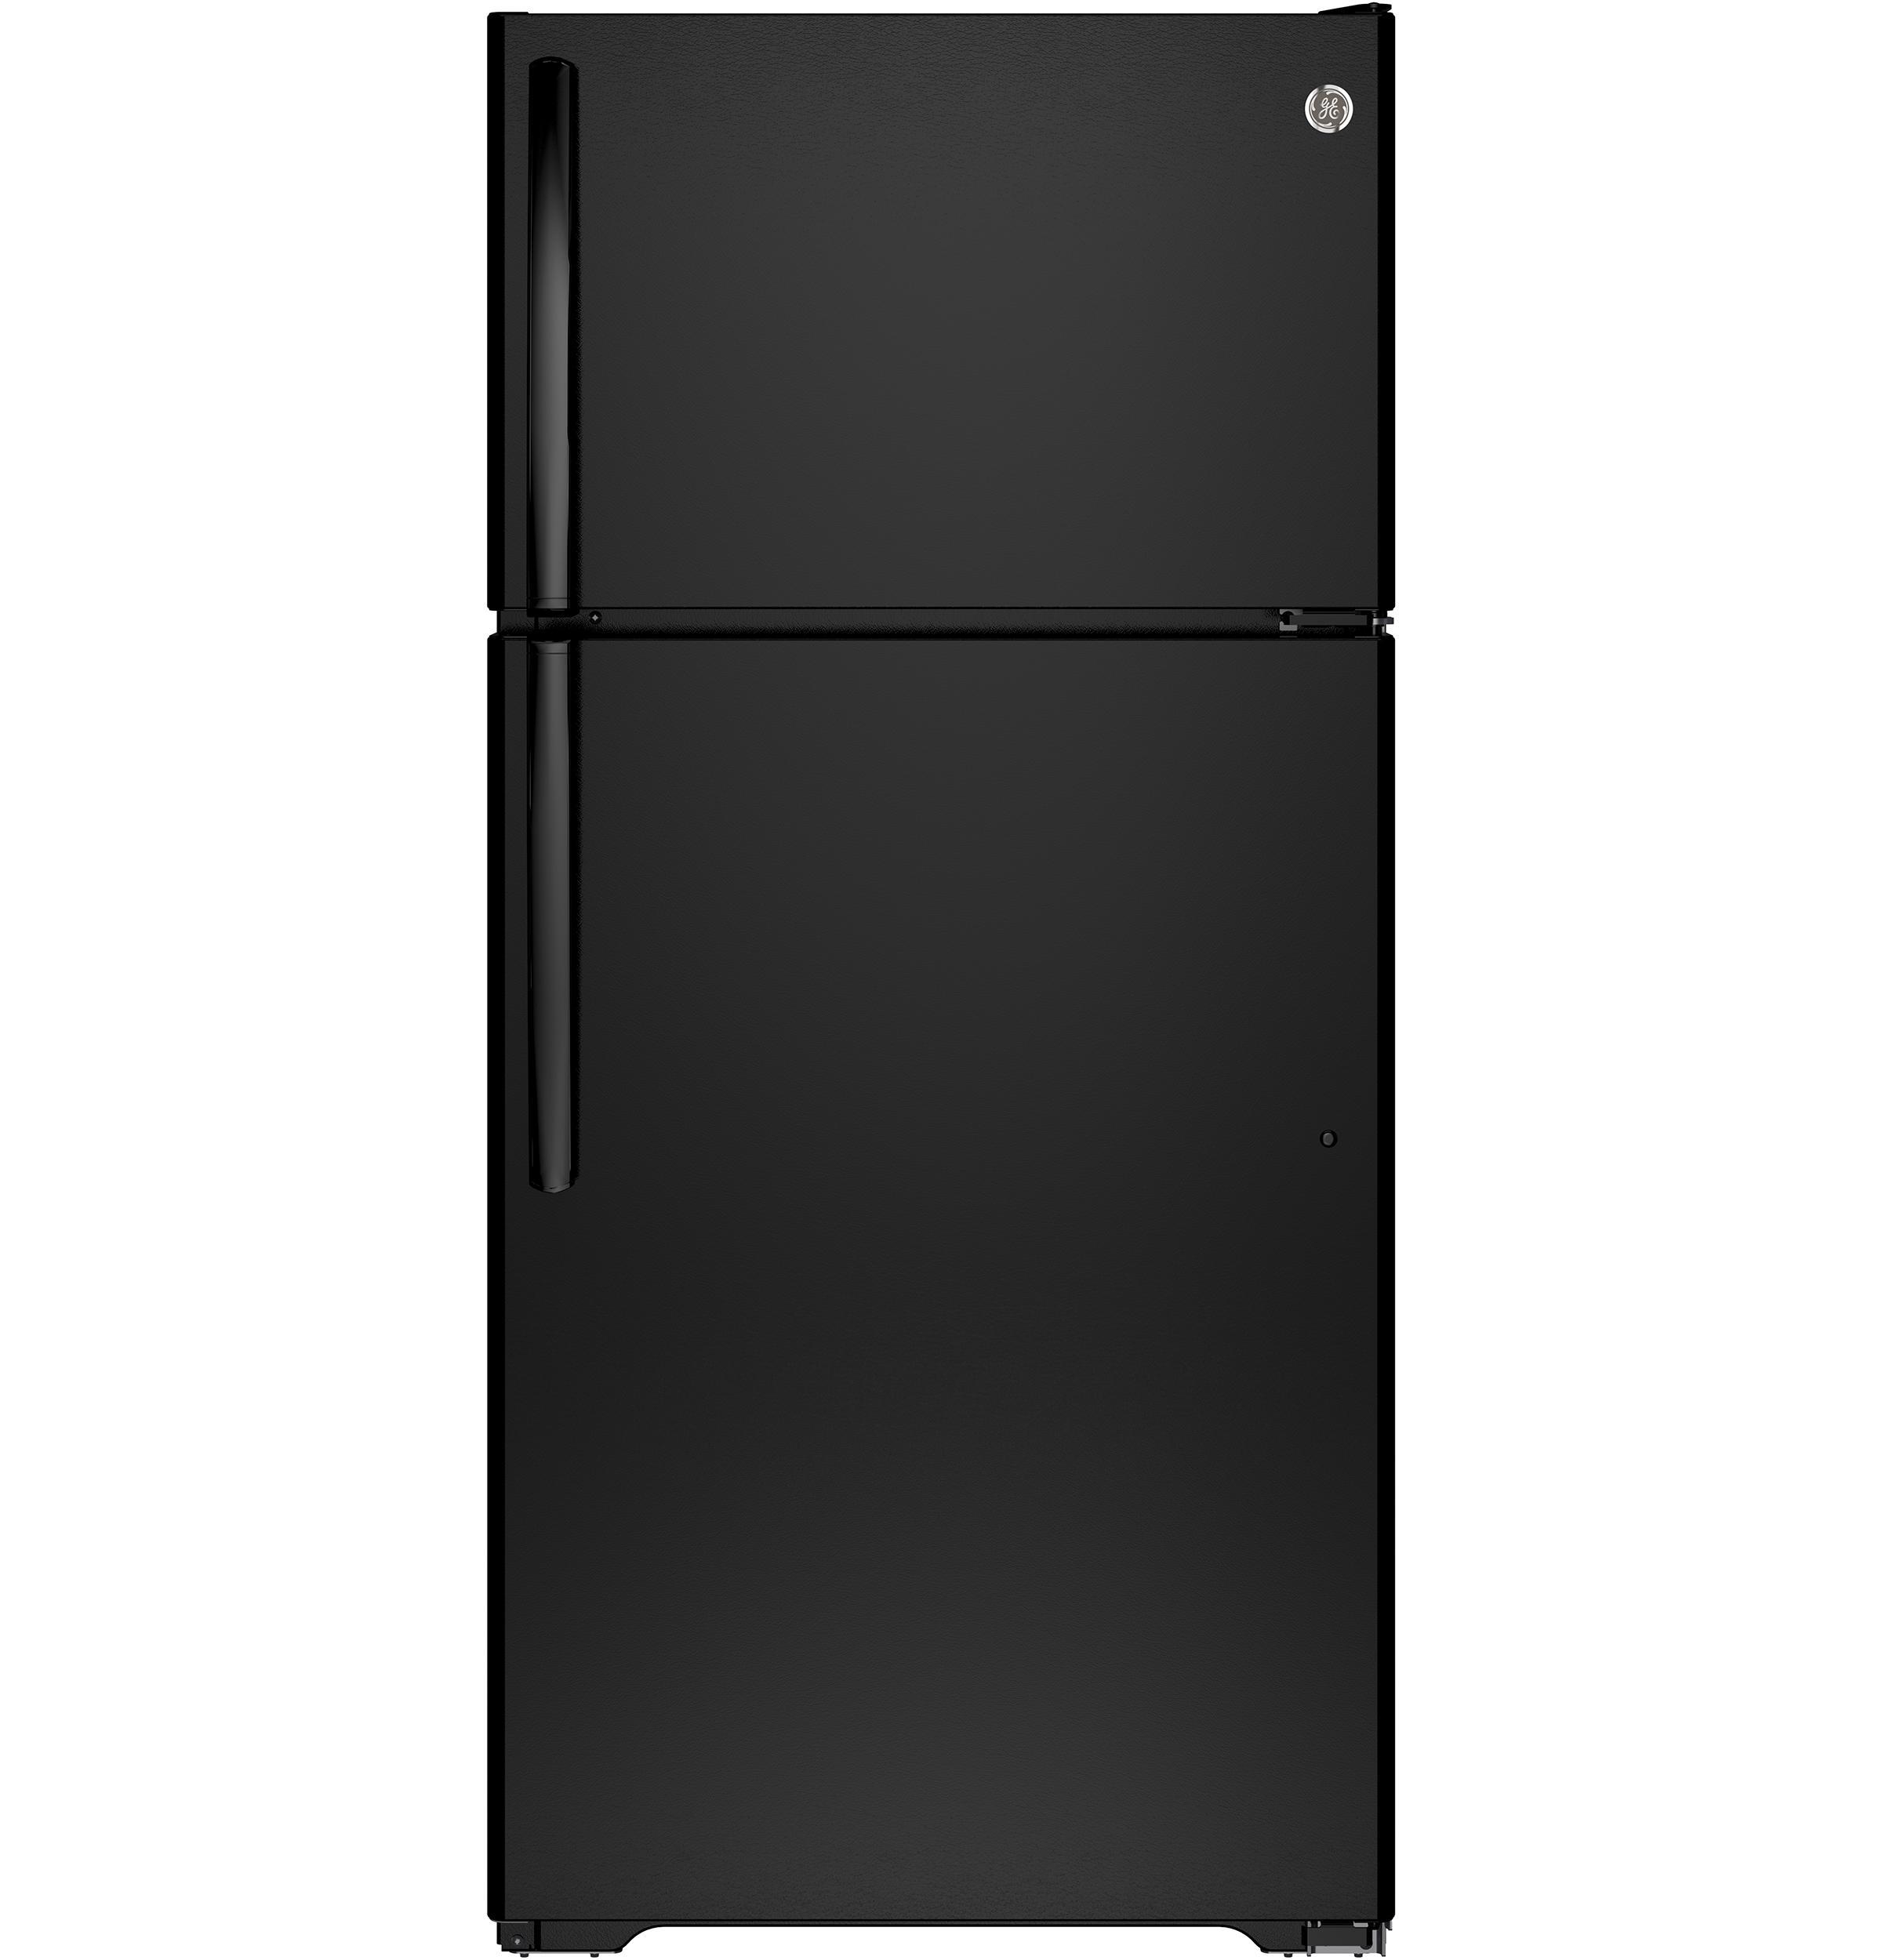 GEEnergy Star® 14.6 Cu. Ft. Top-Freezer Refrigerator